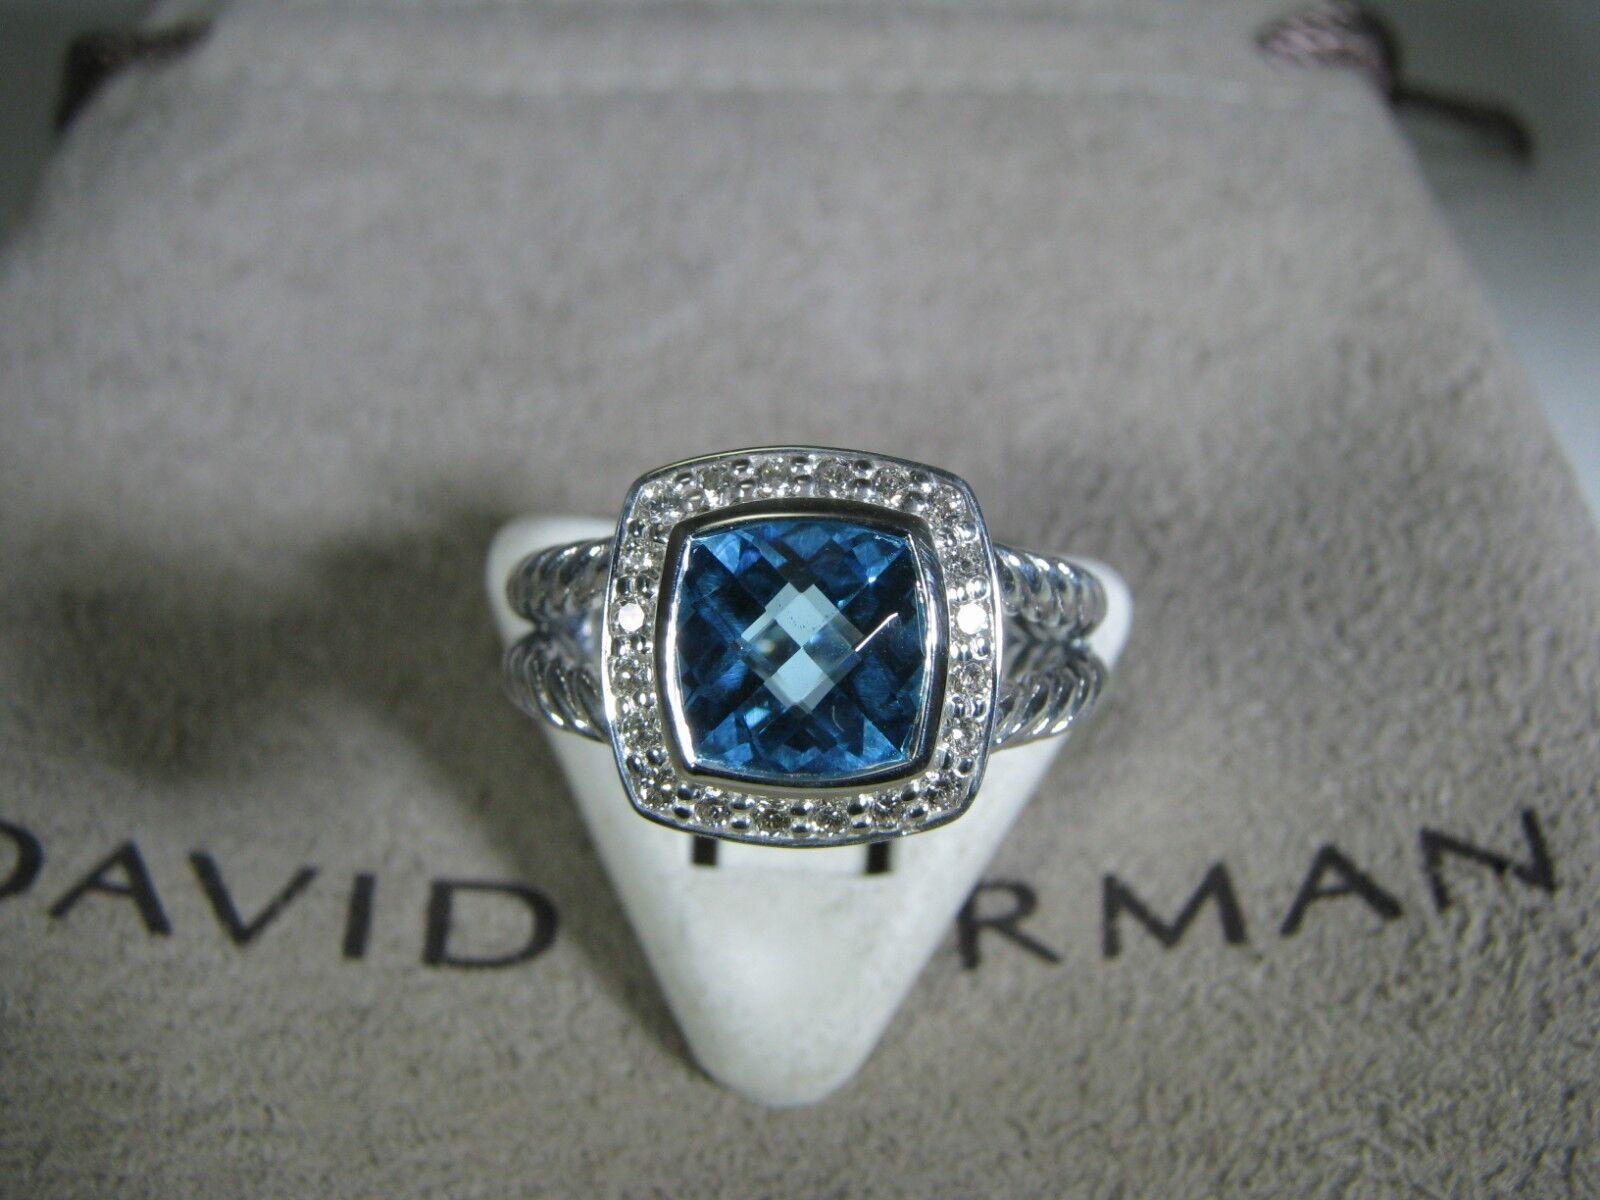 DAVID YURMAN AUTHENTIC ALBION 7MM blueE TOPAZ PAVE DIAMOND RING SIZE 6 D.Y. POUCH